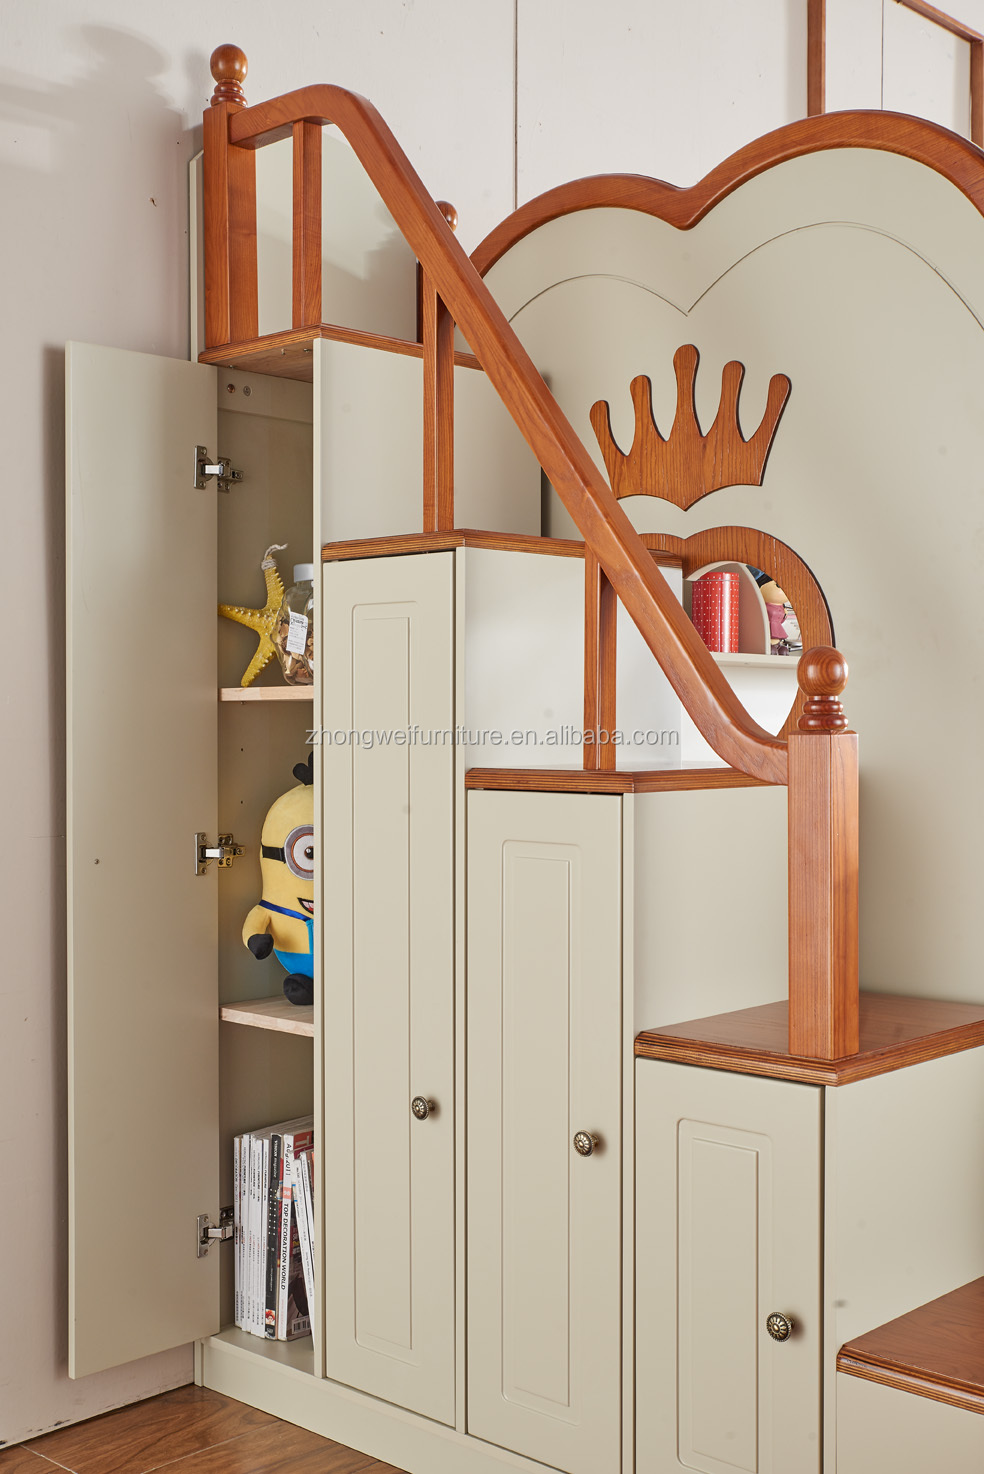 Creativo de madera doble cama litera para ni os y madre - Cama doble para ninos ...